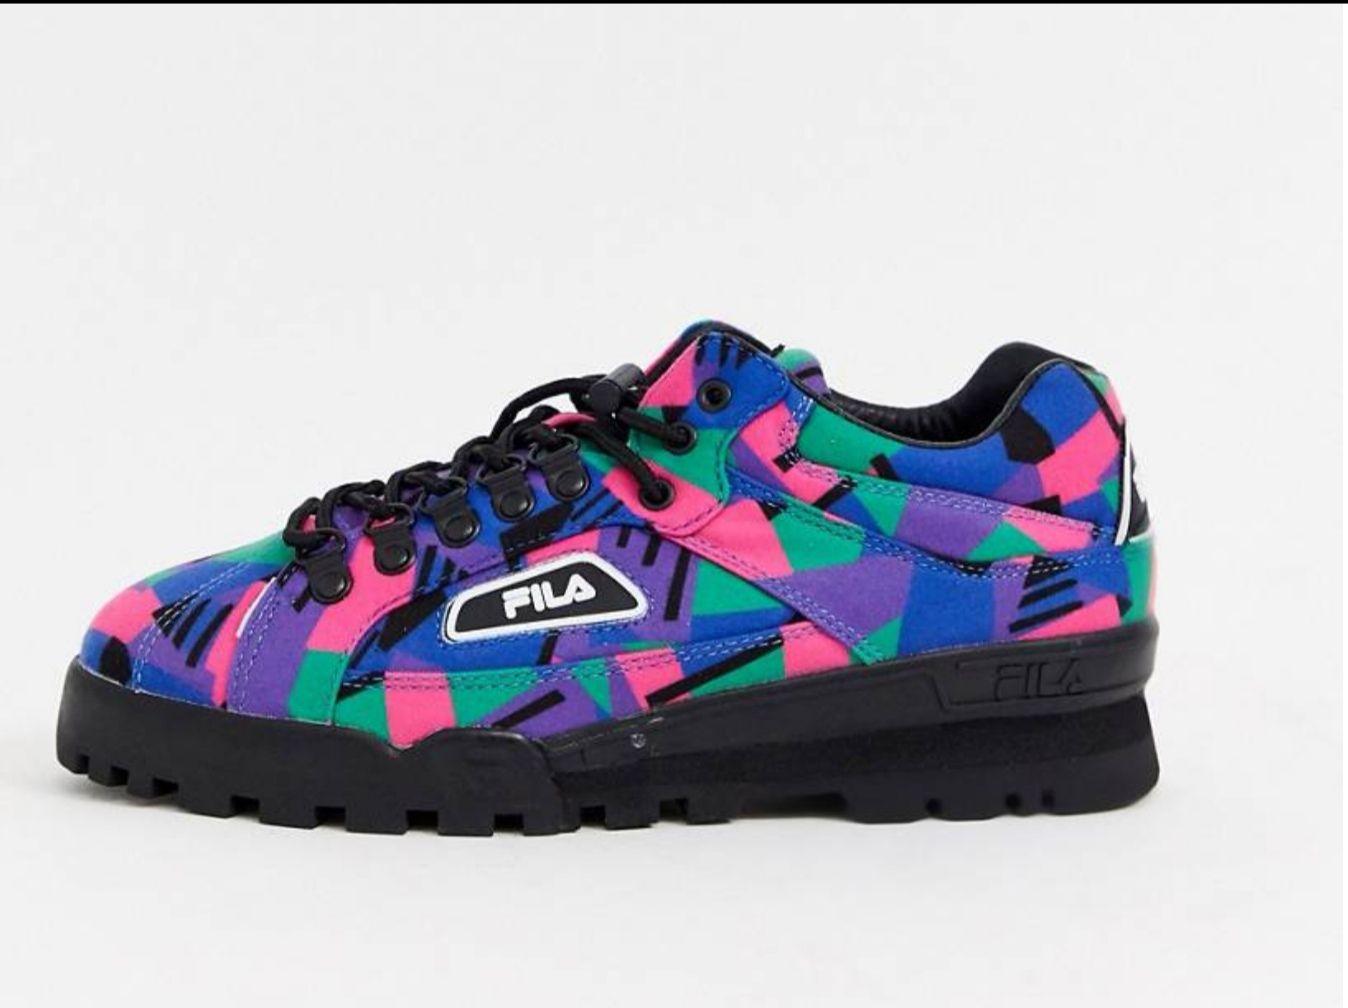 Zapatillas estilo excursionista TrailBlazer de Fila